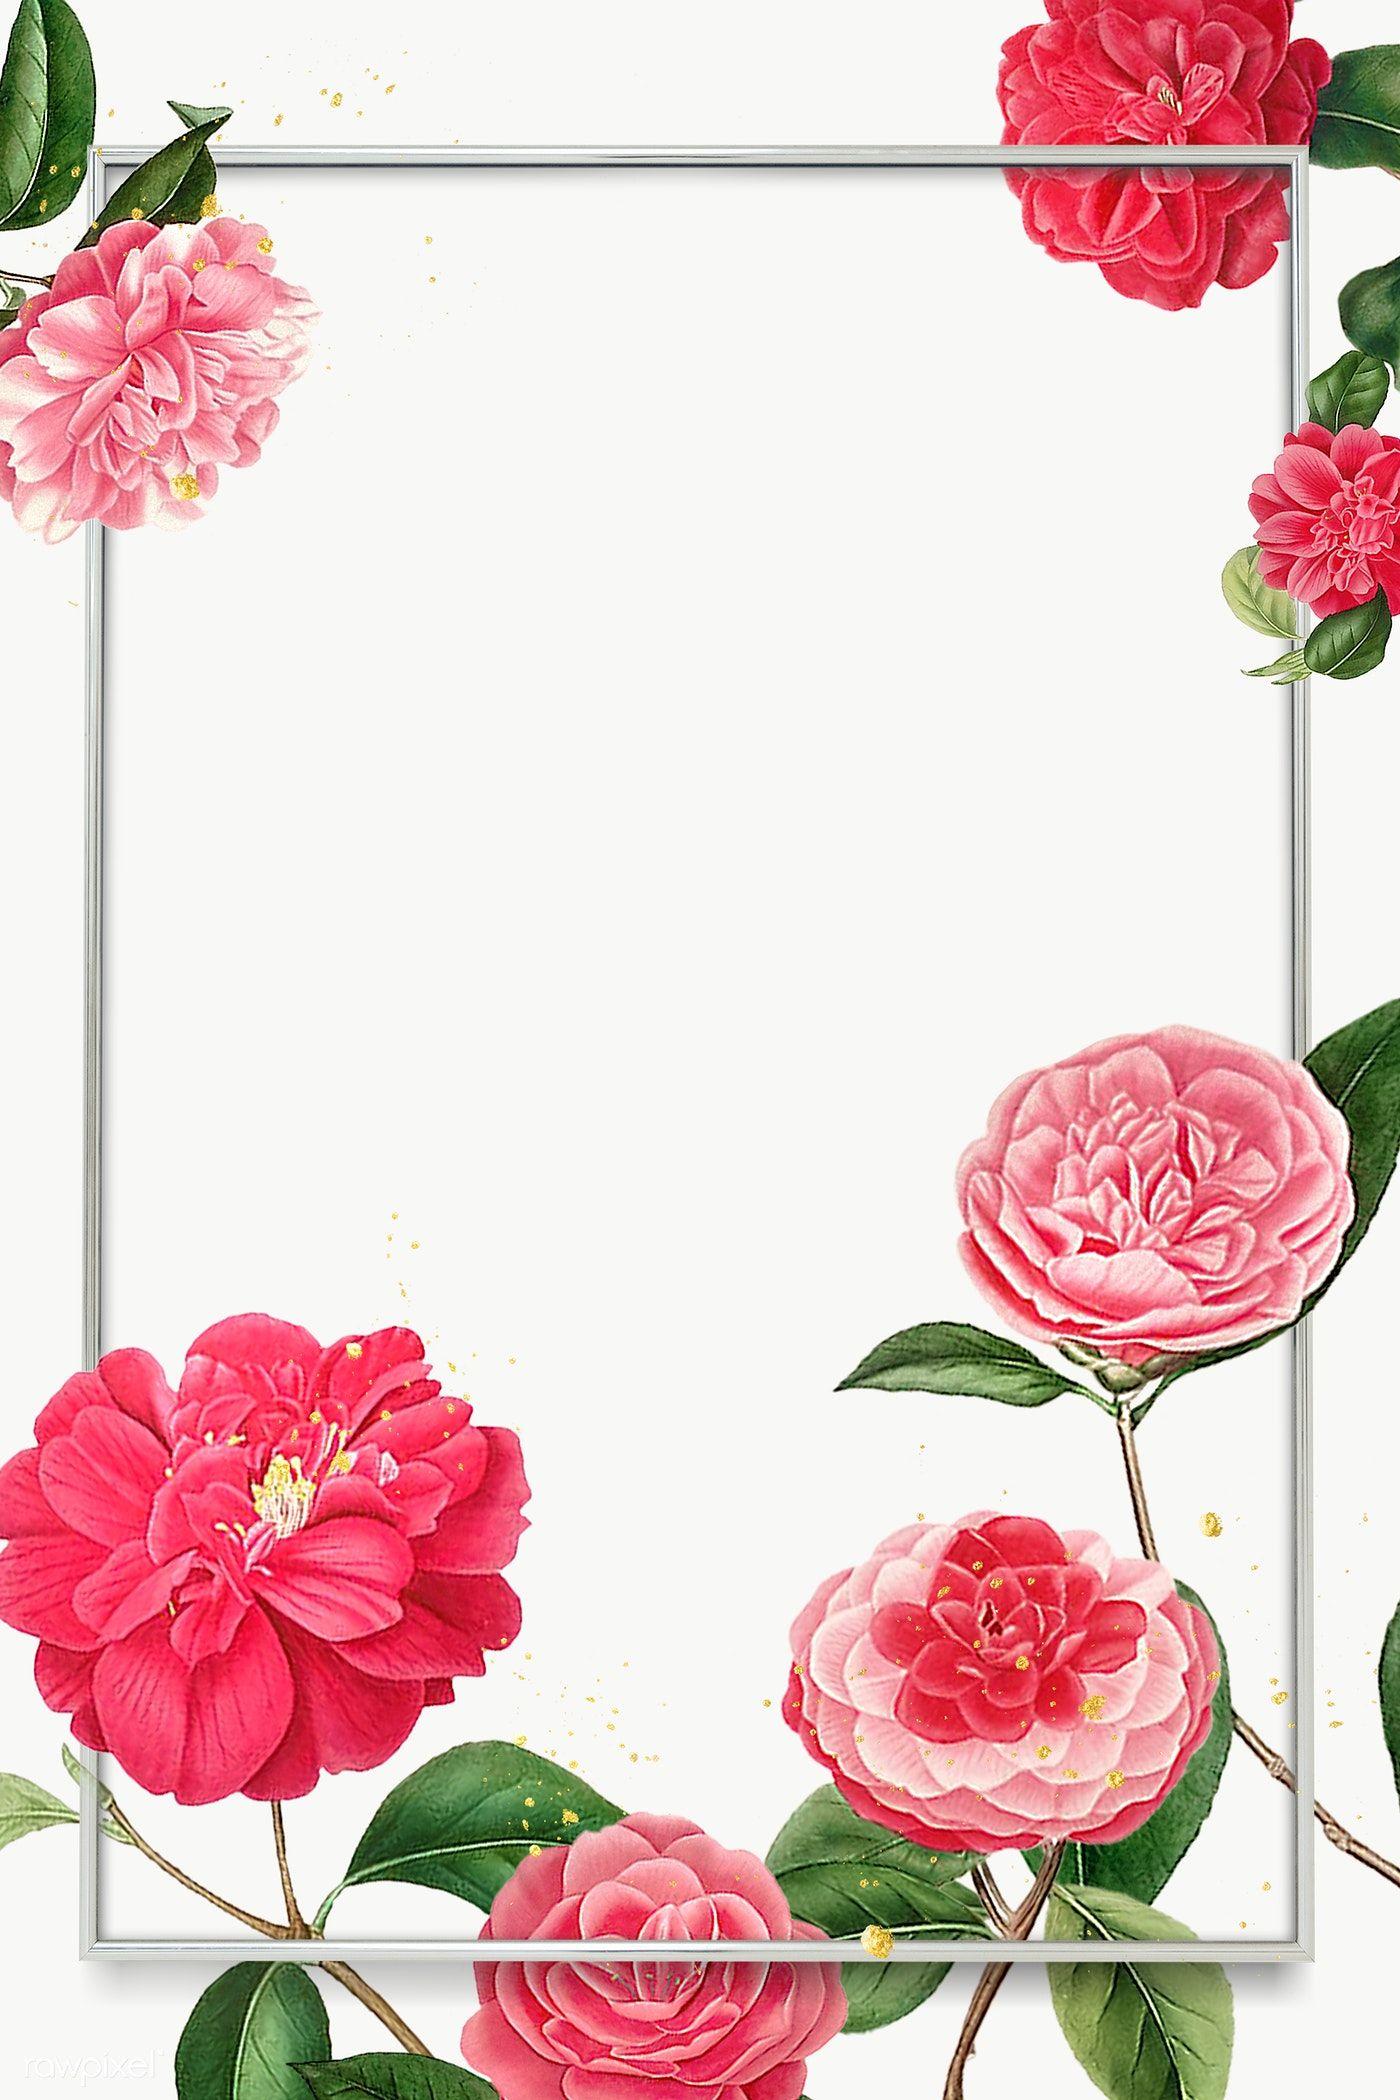 Download Premium Png Of Red And Pink Camellia Flower Patterned Blank Frame Flower Illustration Flower Frame Camellia Flower